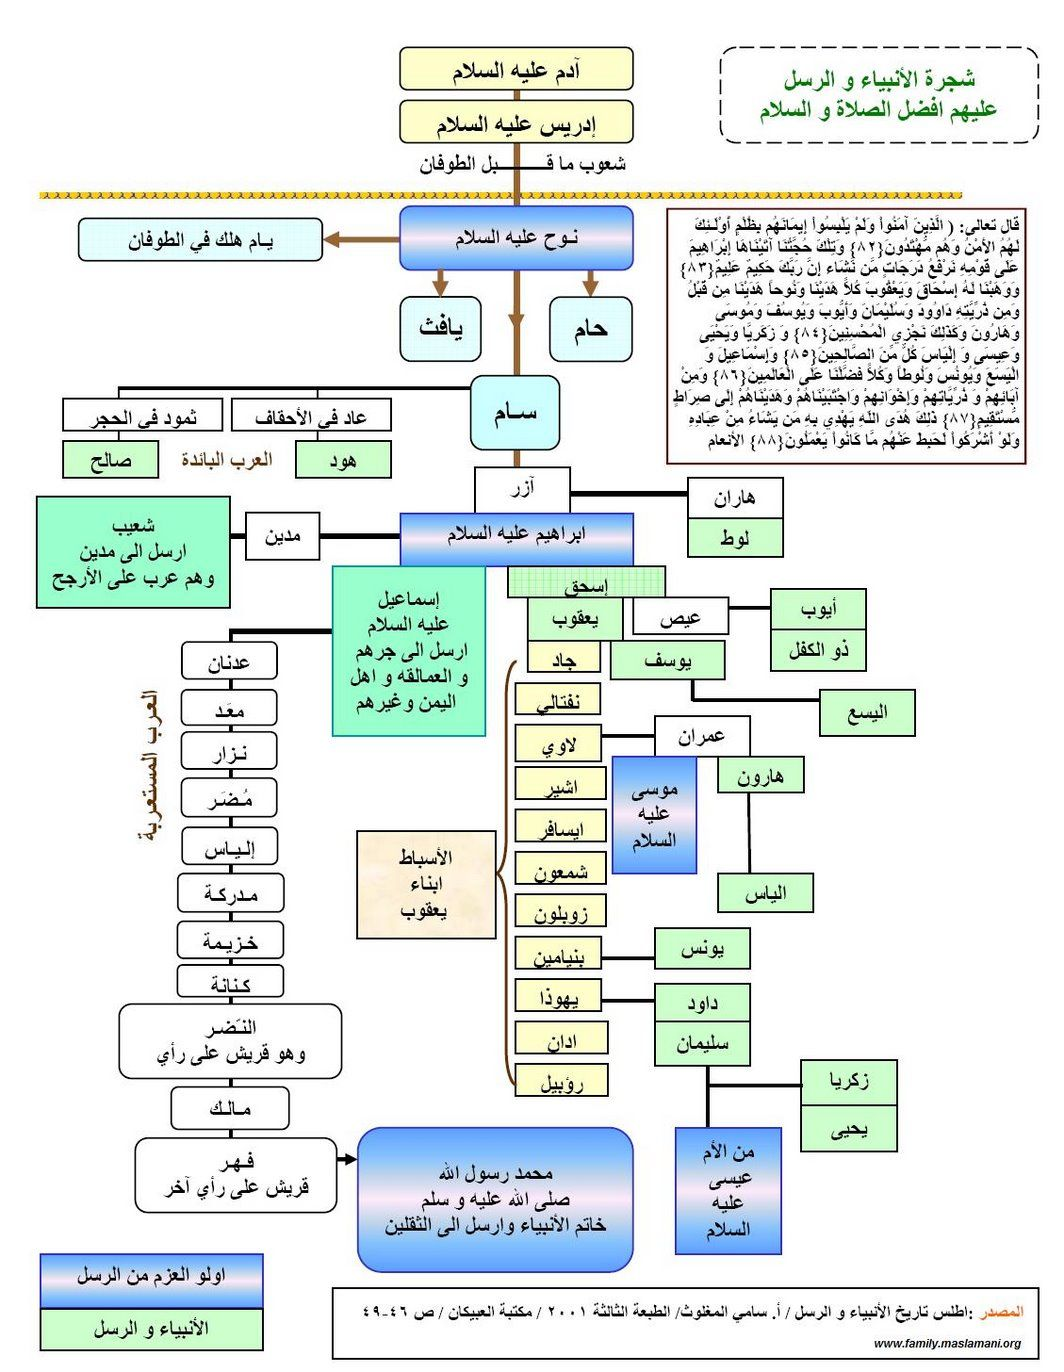 Image Result For شجرة الانبياء Islam Facts Learn Islam Islam Beliefs